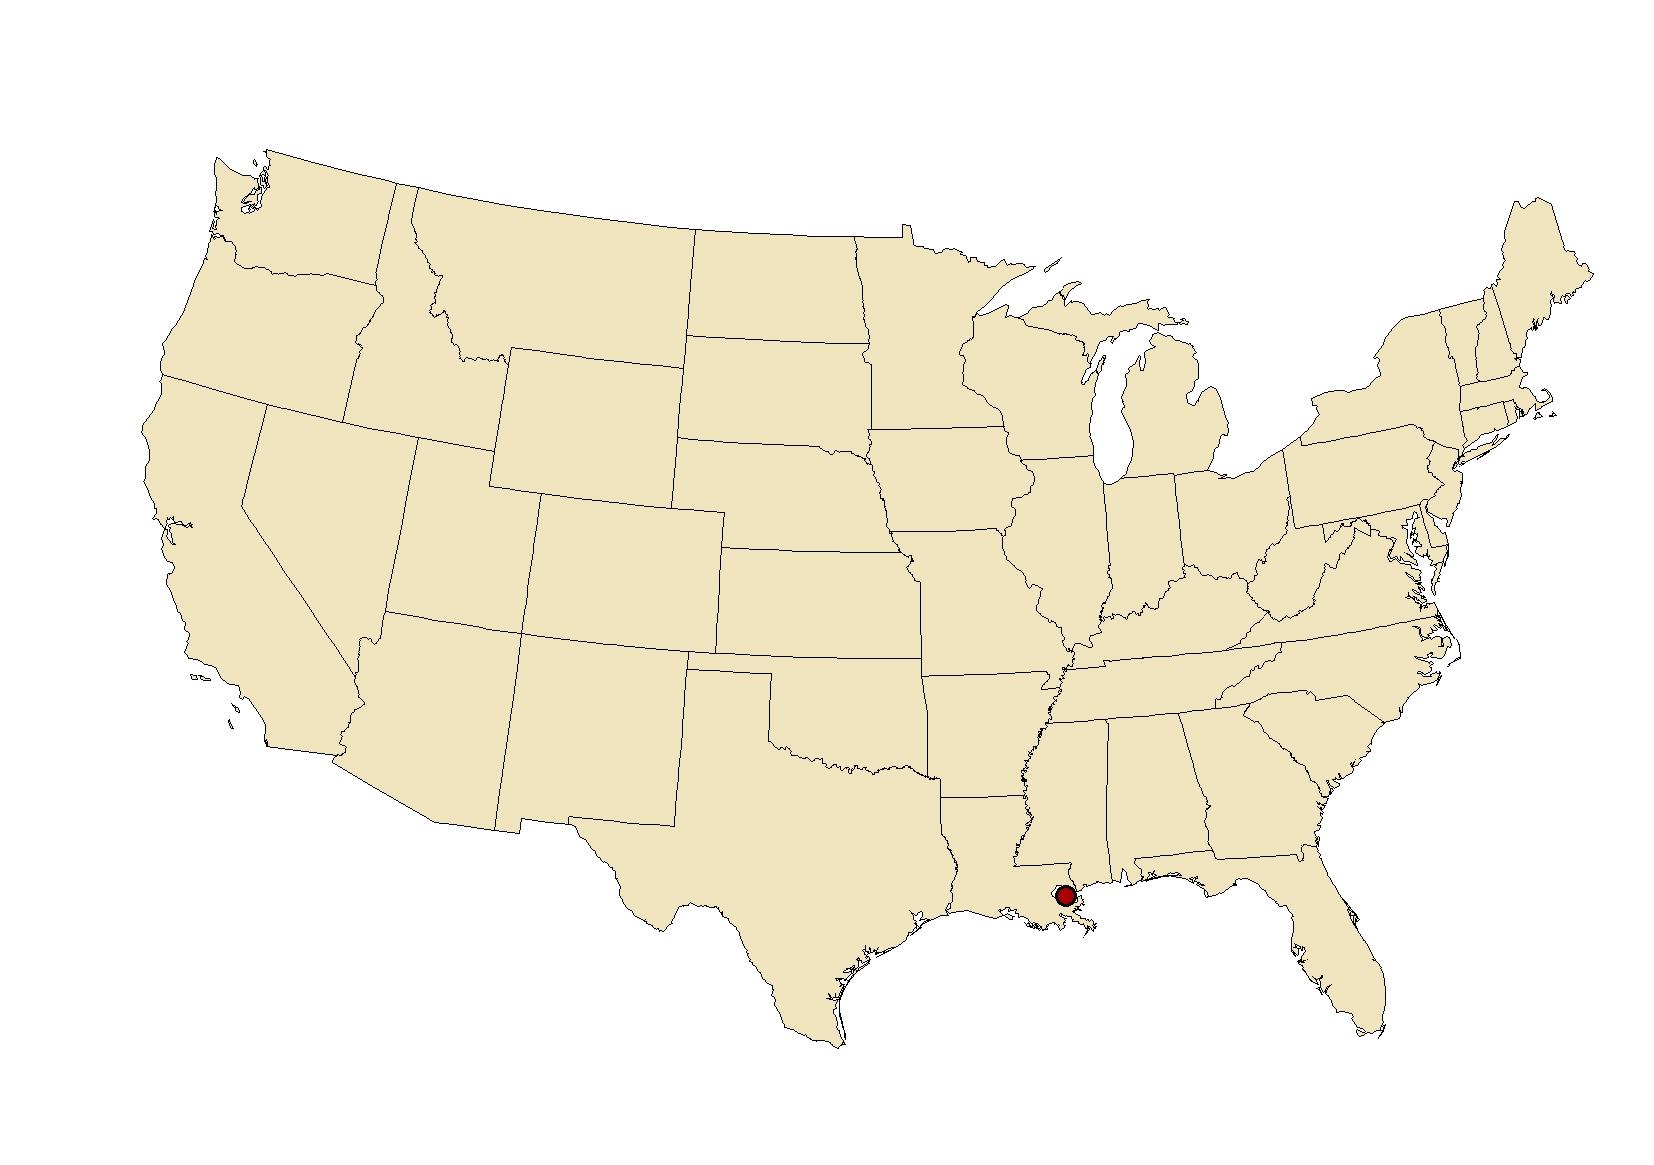 FileNeworleansmapjpg Wikimedia Commons - New orleans on the us map